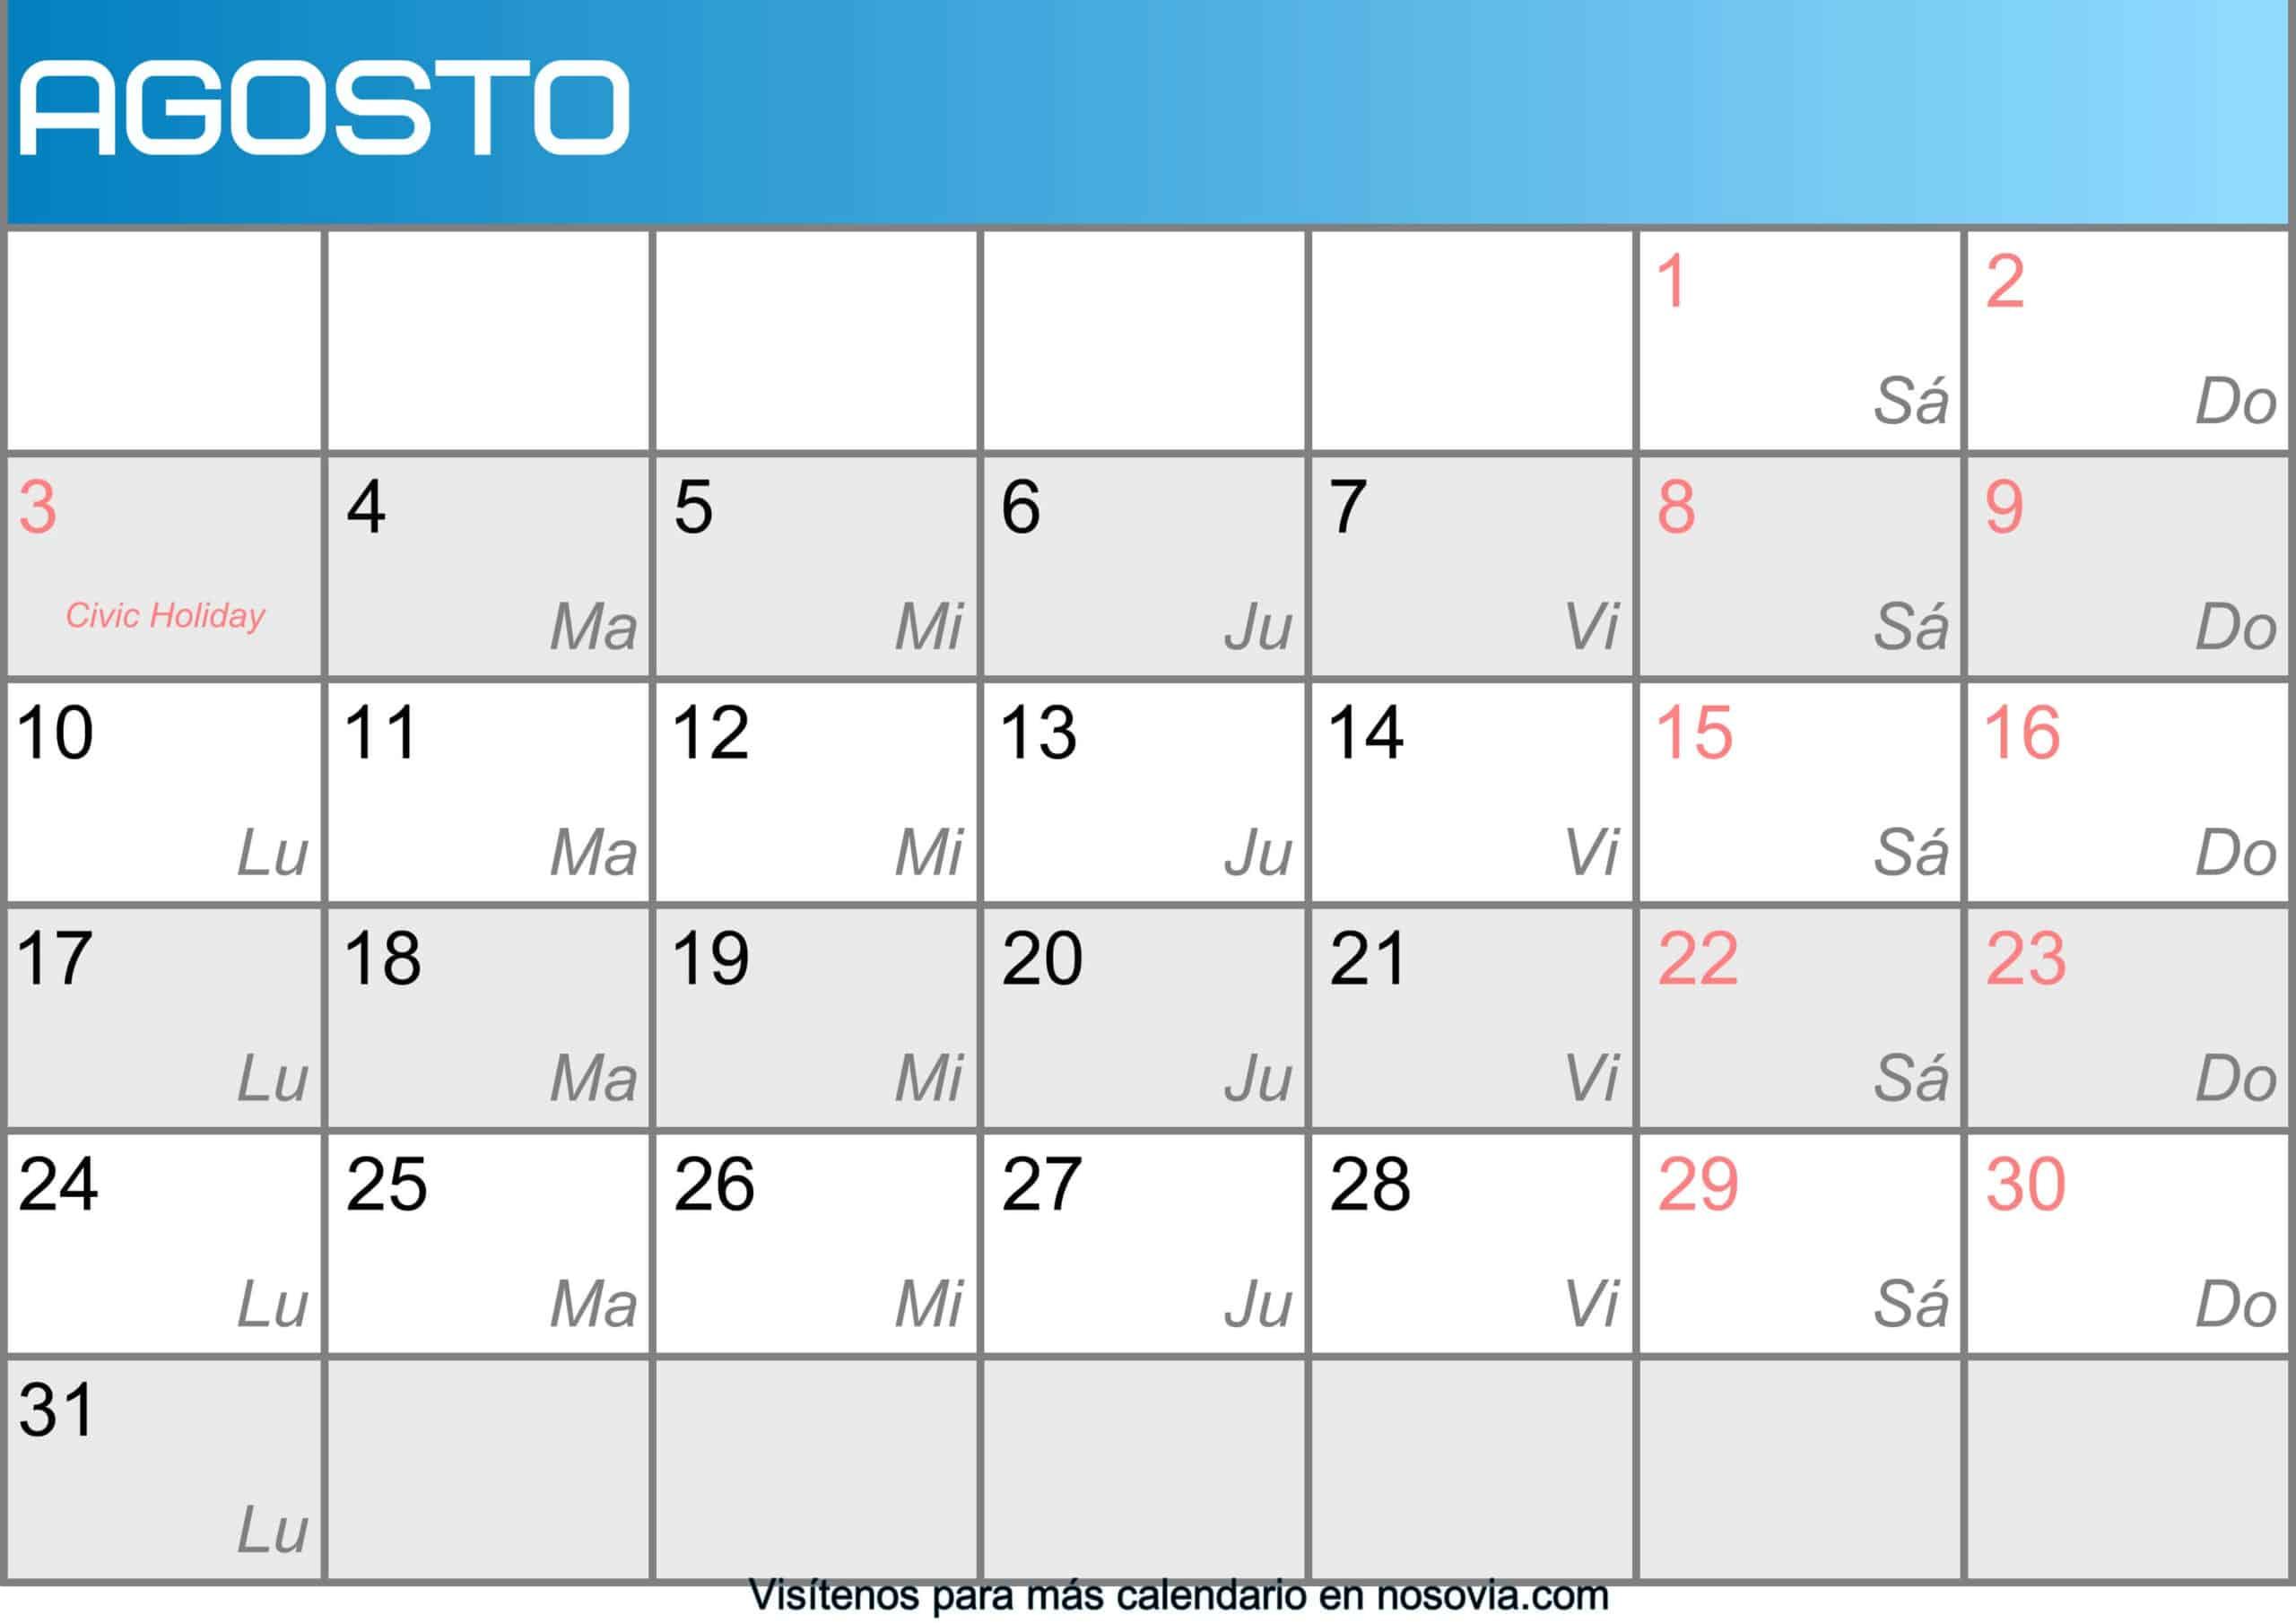 Calendario-agosto-2020-Con-Festivos-Imágenes